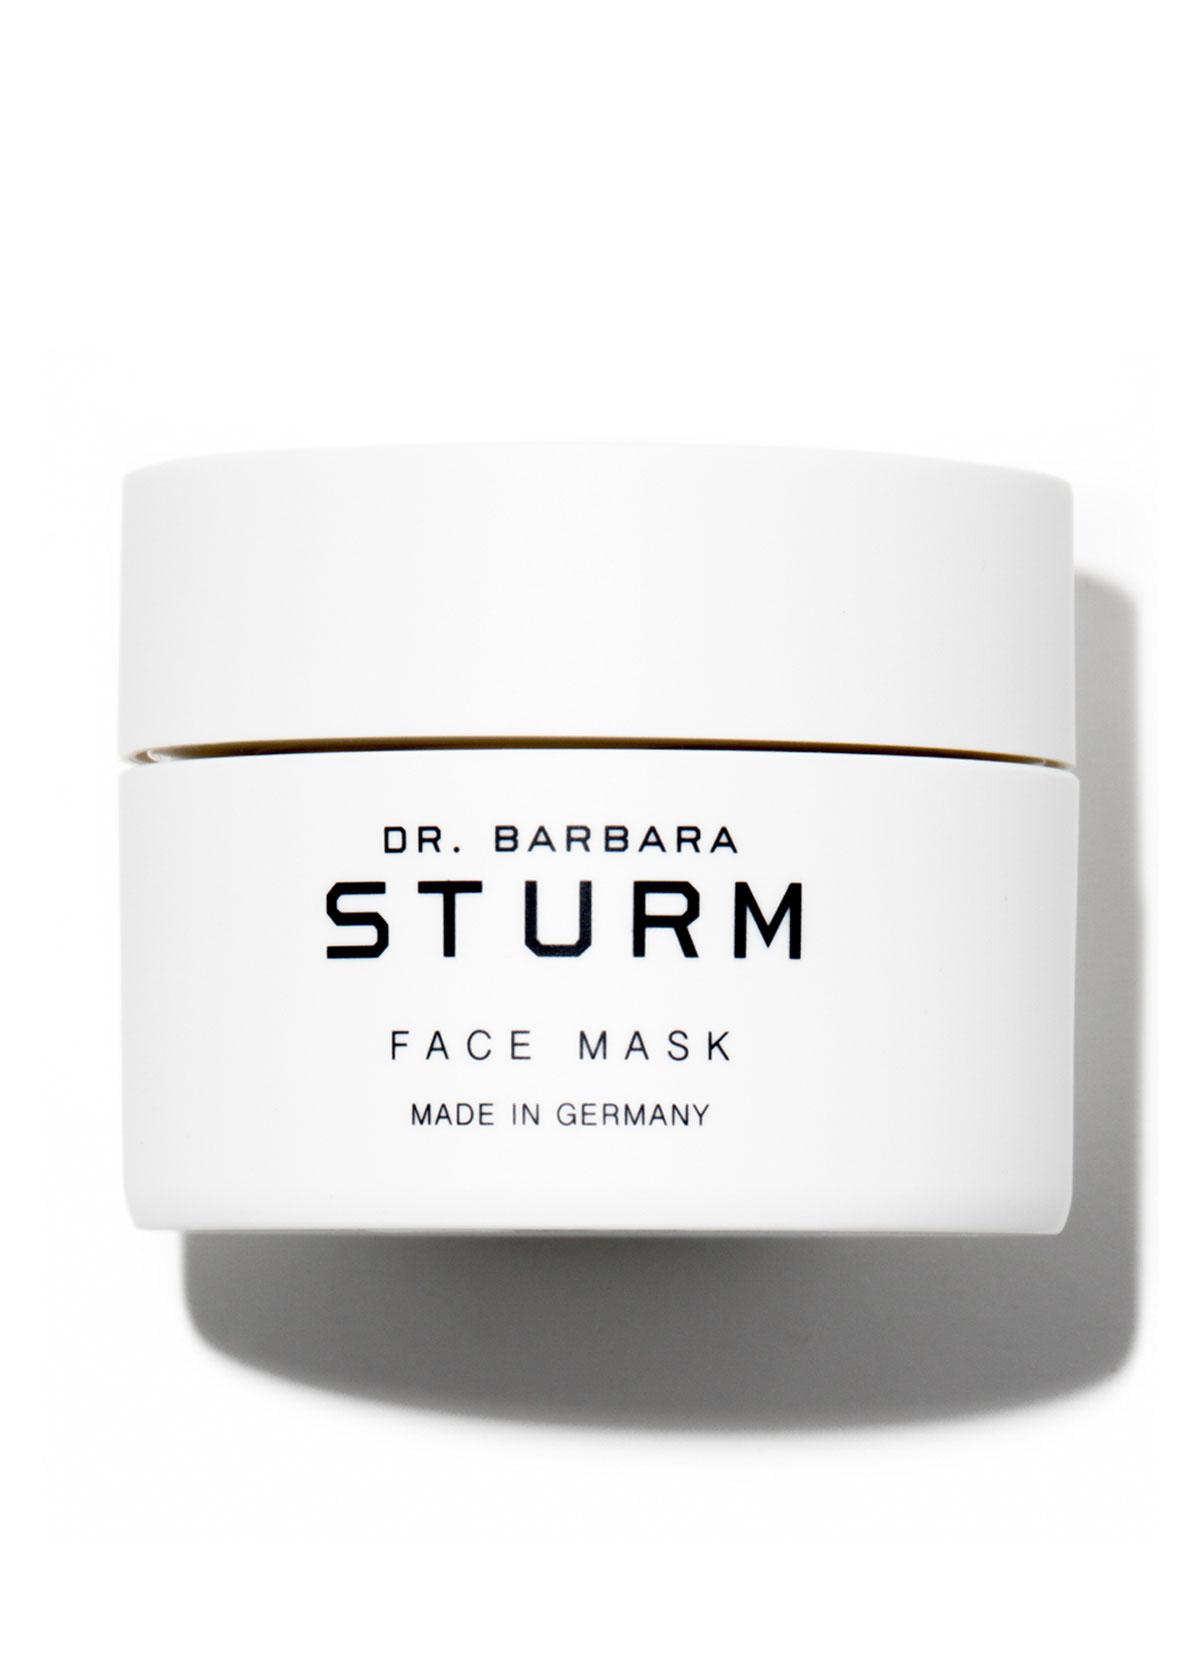 Dr. Barbara Sturm FACE MASK, 1.7 OZ./ 50 ML